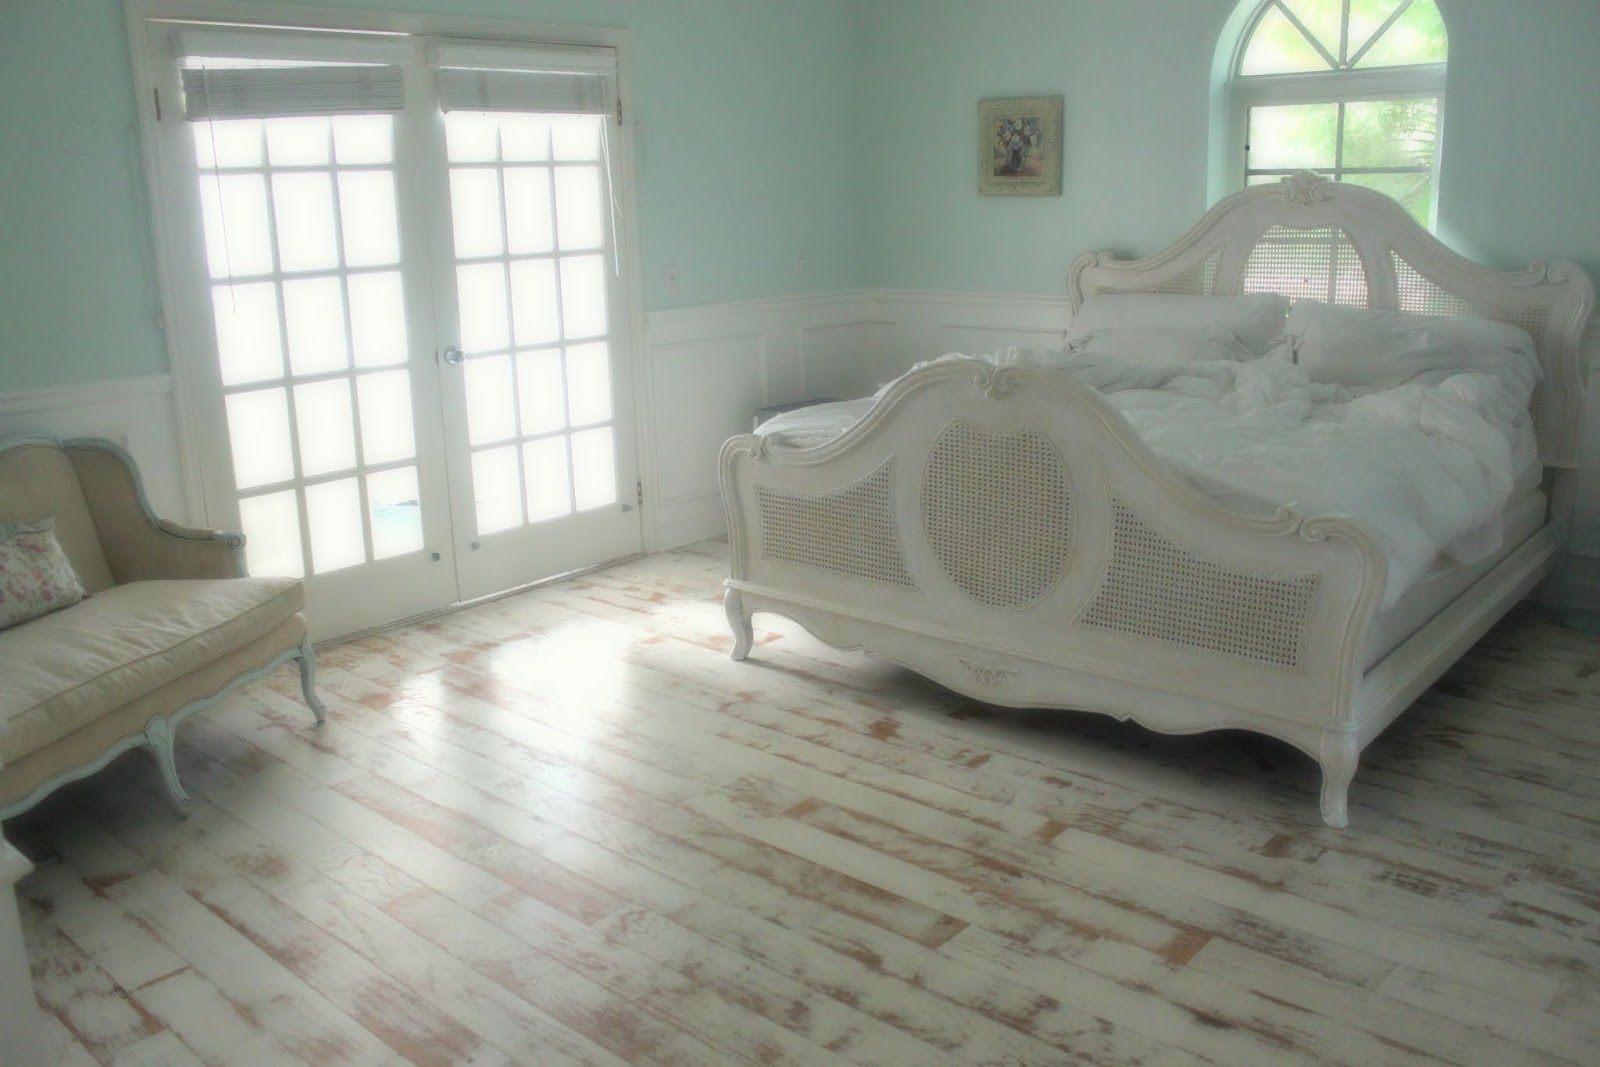 Bedrooms Distressed Wood Floors Shabby Chic Flooring Painted Wood Floors